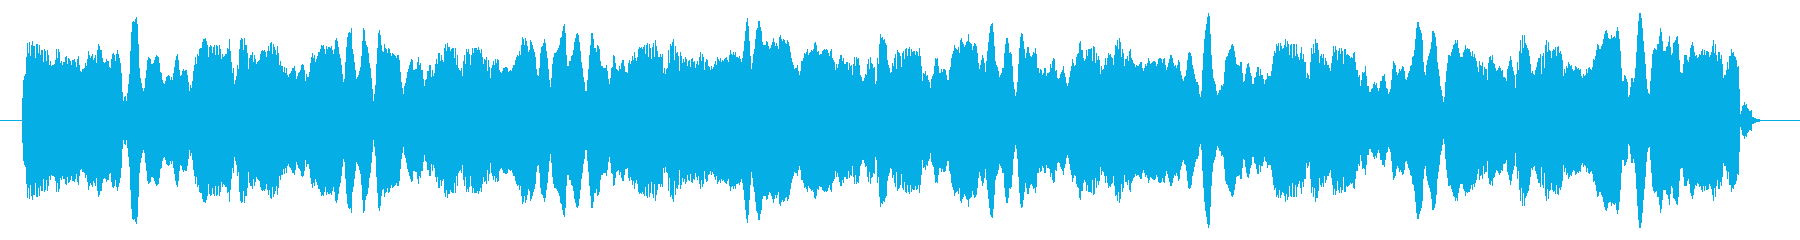 8bitパワーU-D-02-2_dryの再生済みの波形